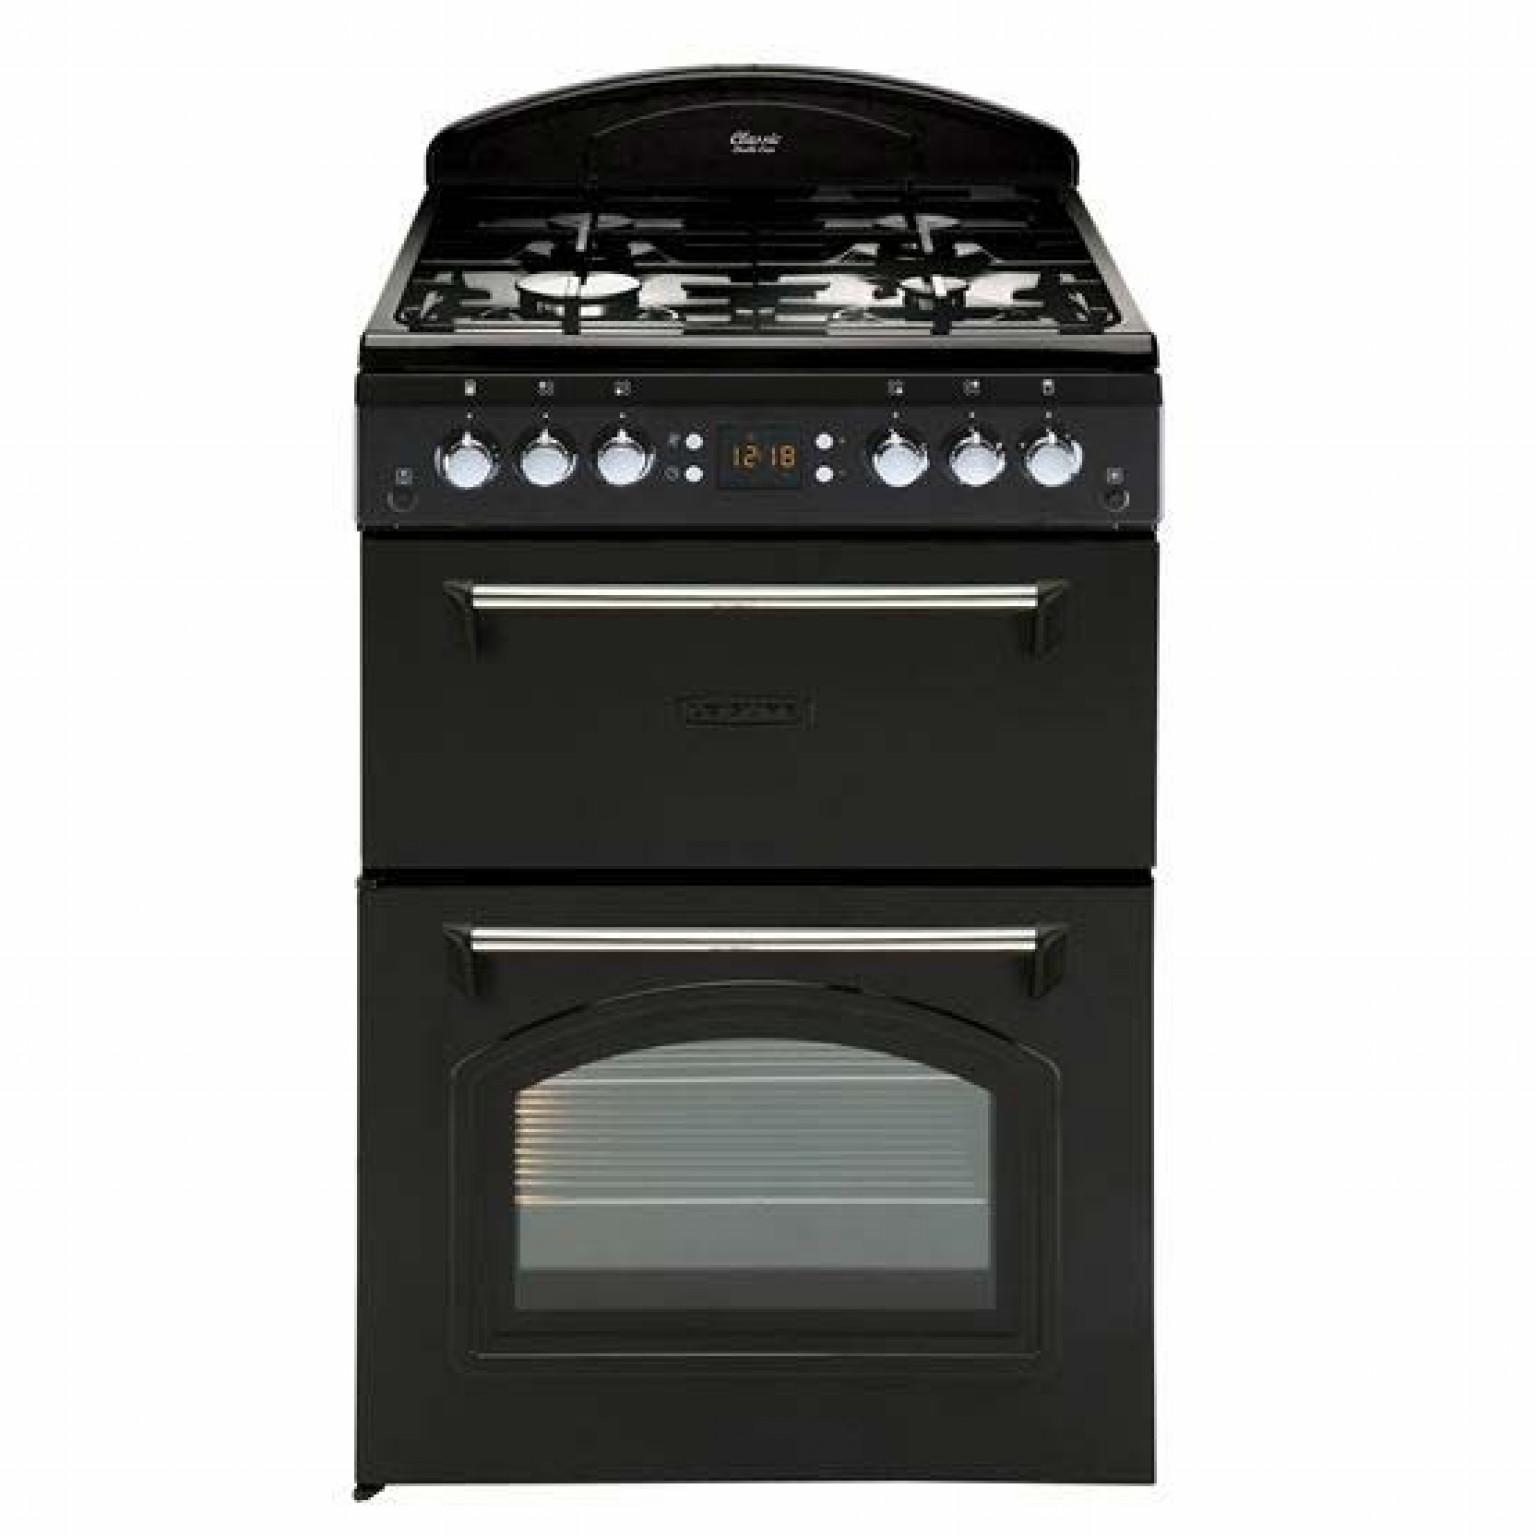 Leisure 60cm Range Cooker | CLA60GAK